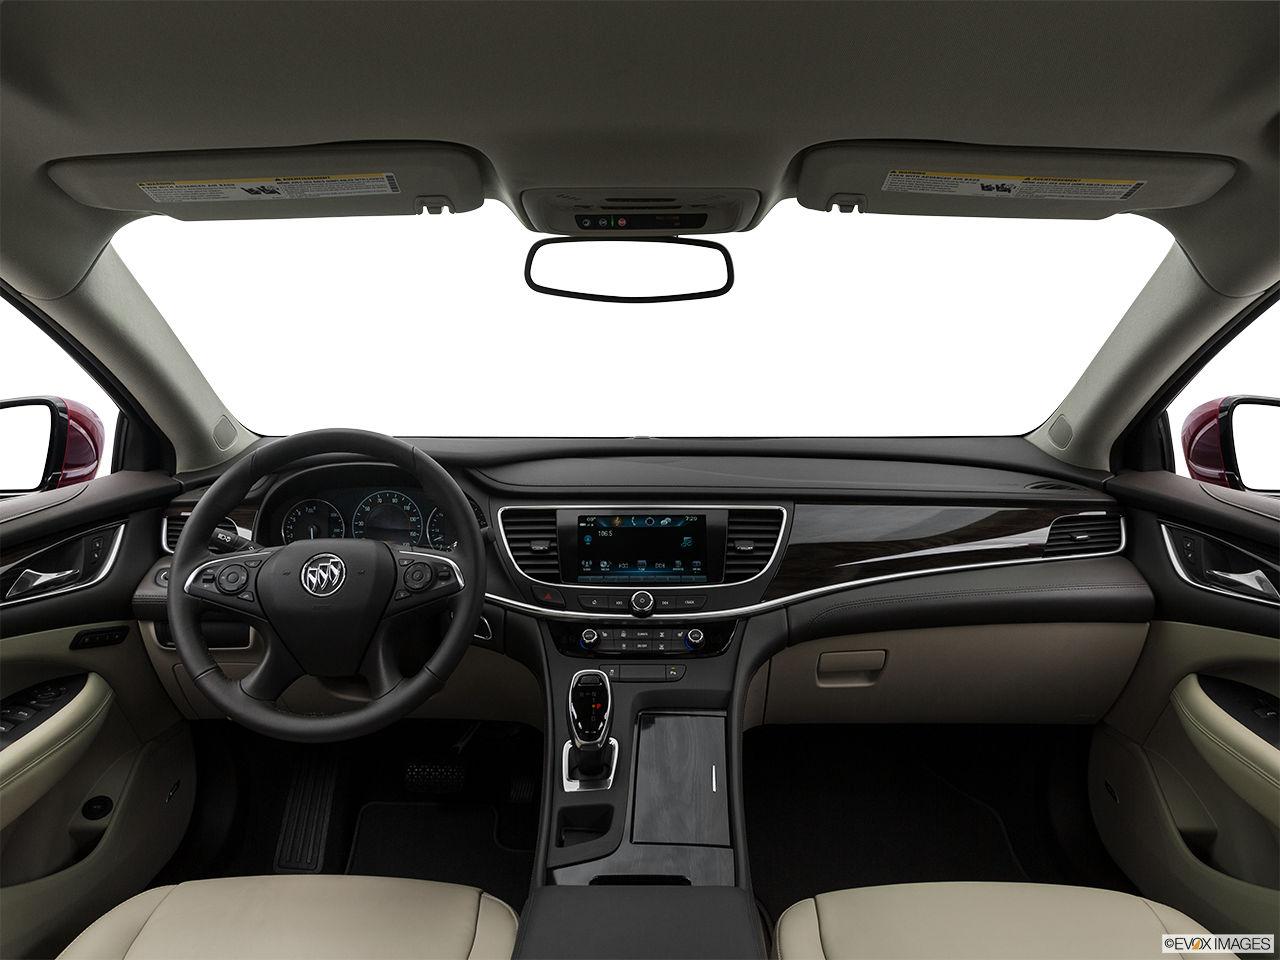 Interior View Of 2017 Buick LaCrosse in Costa Mesa